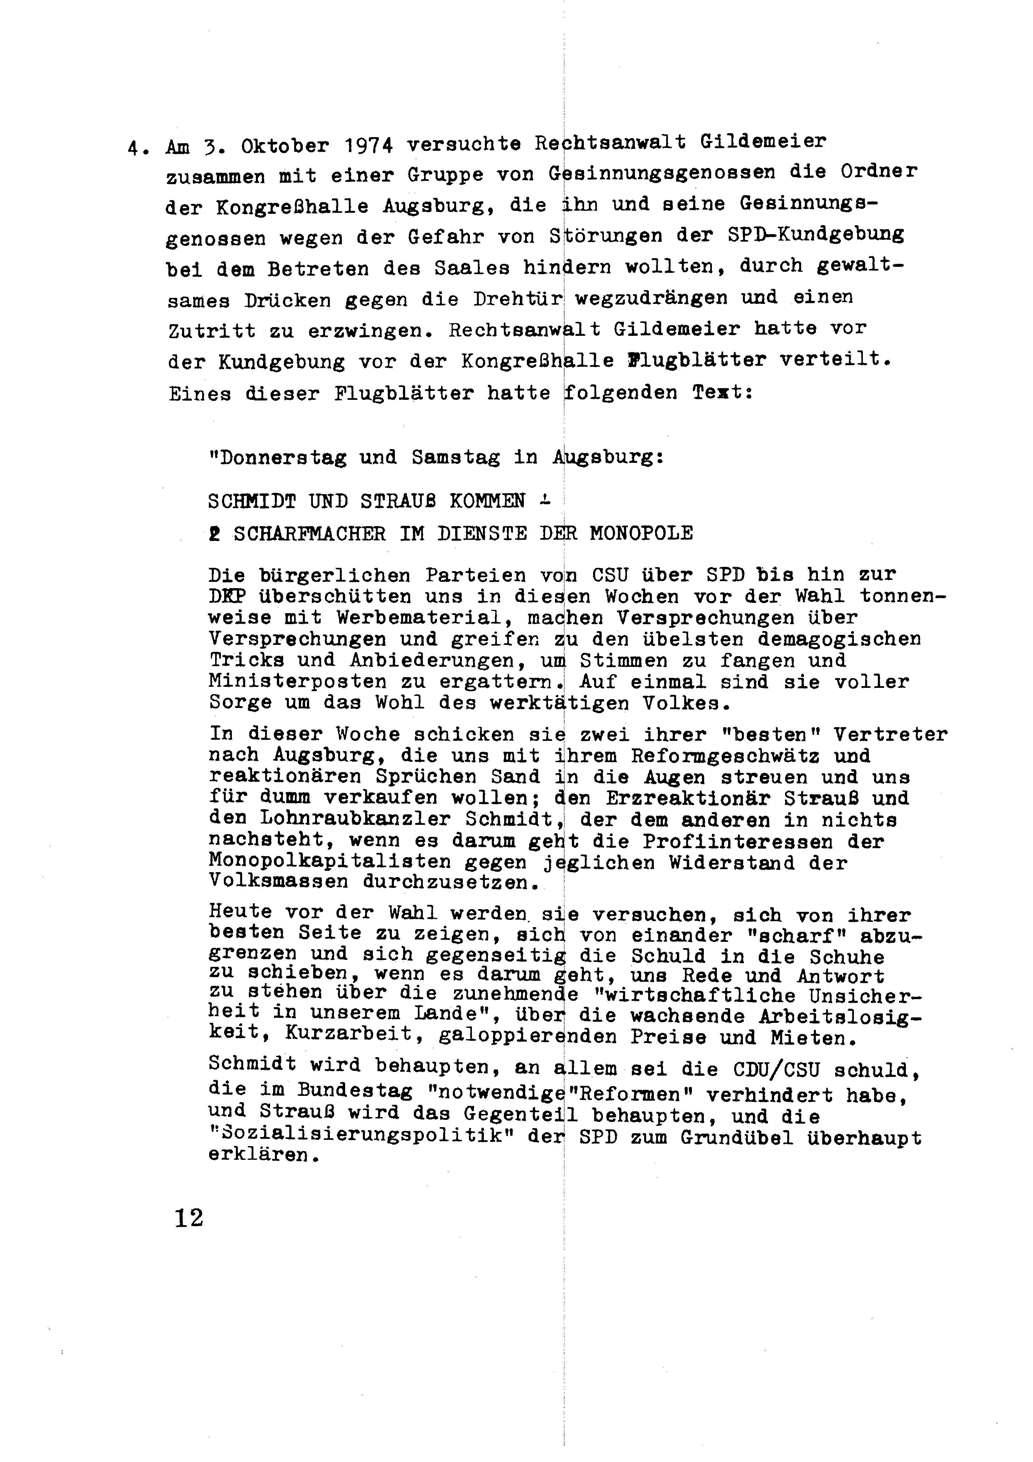 RHeV_Anschuldigung_RA_Gildemeier_Seite_12